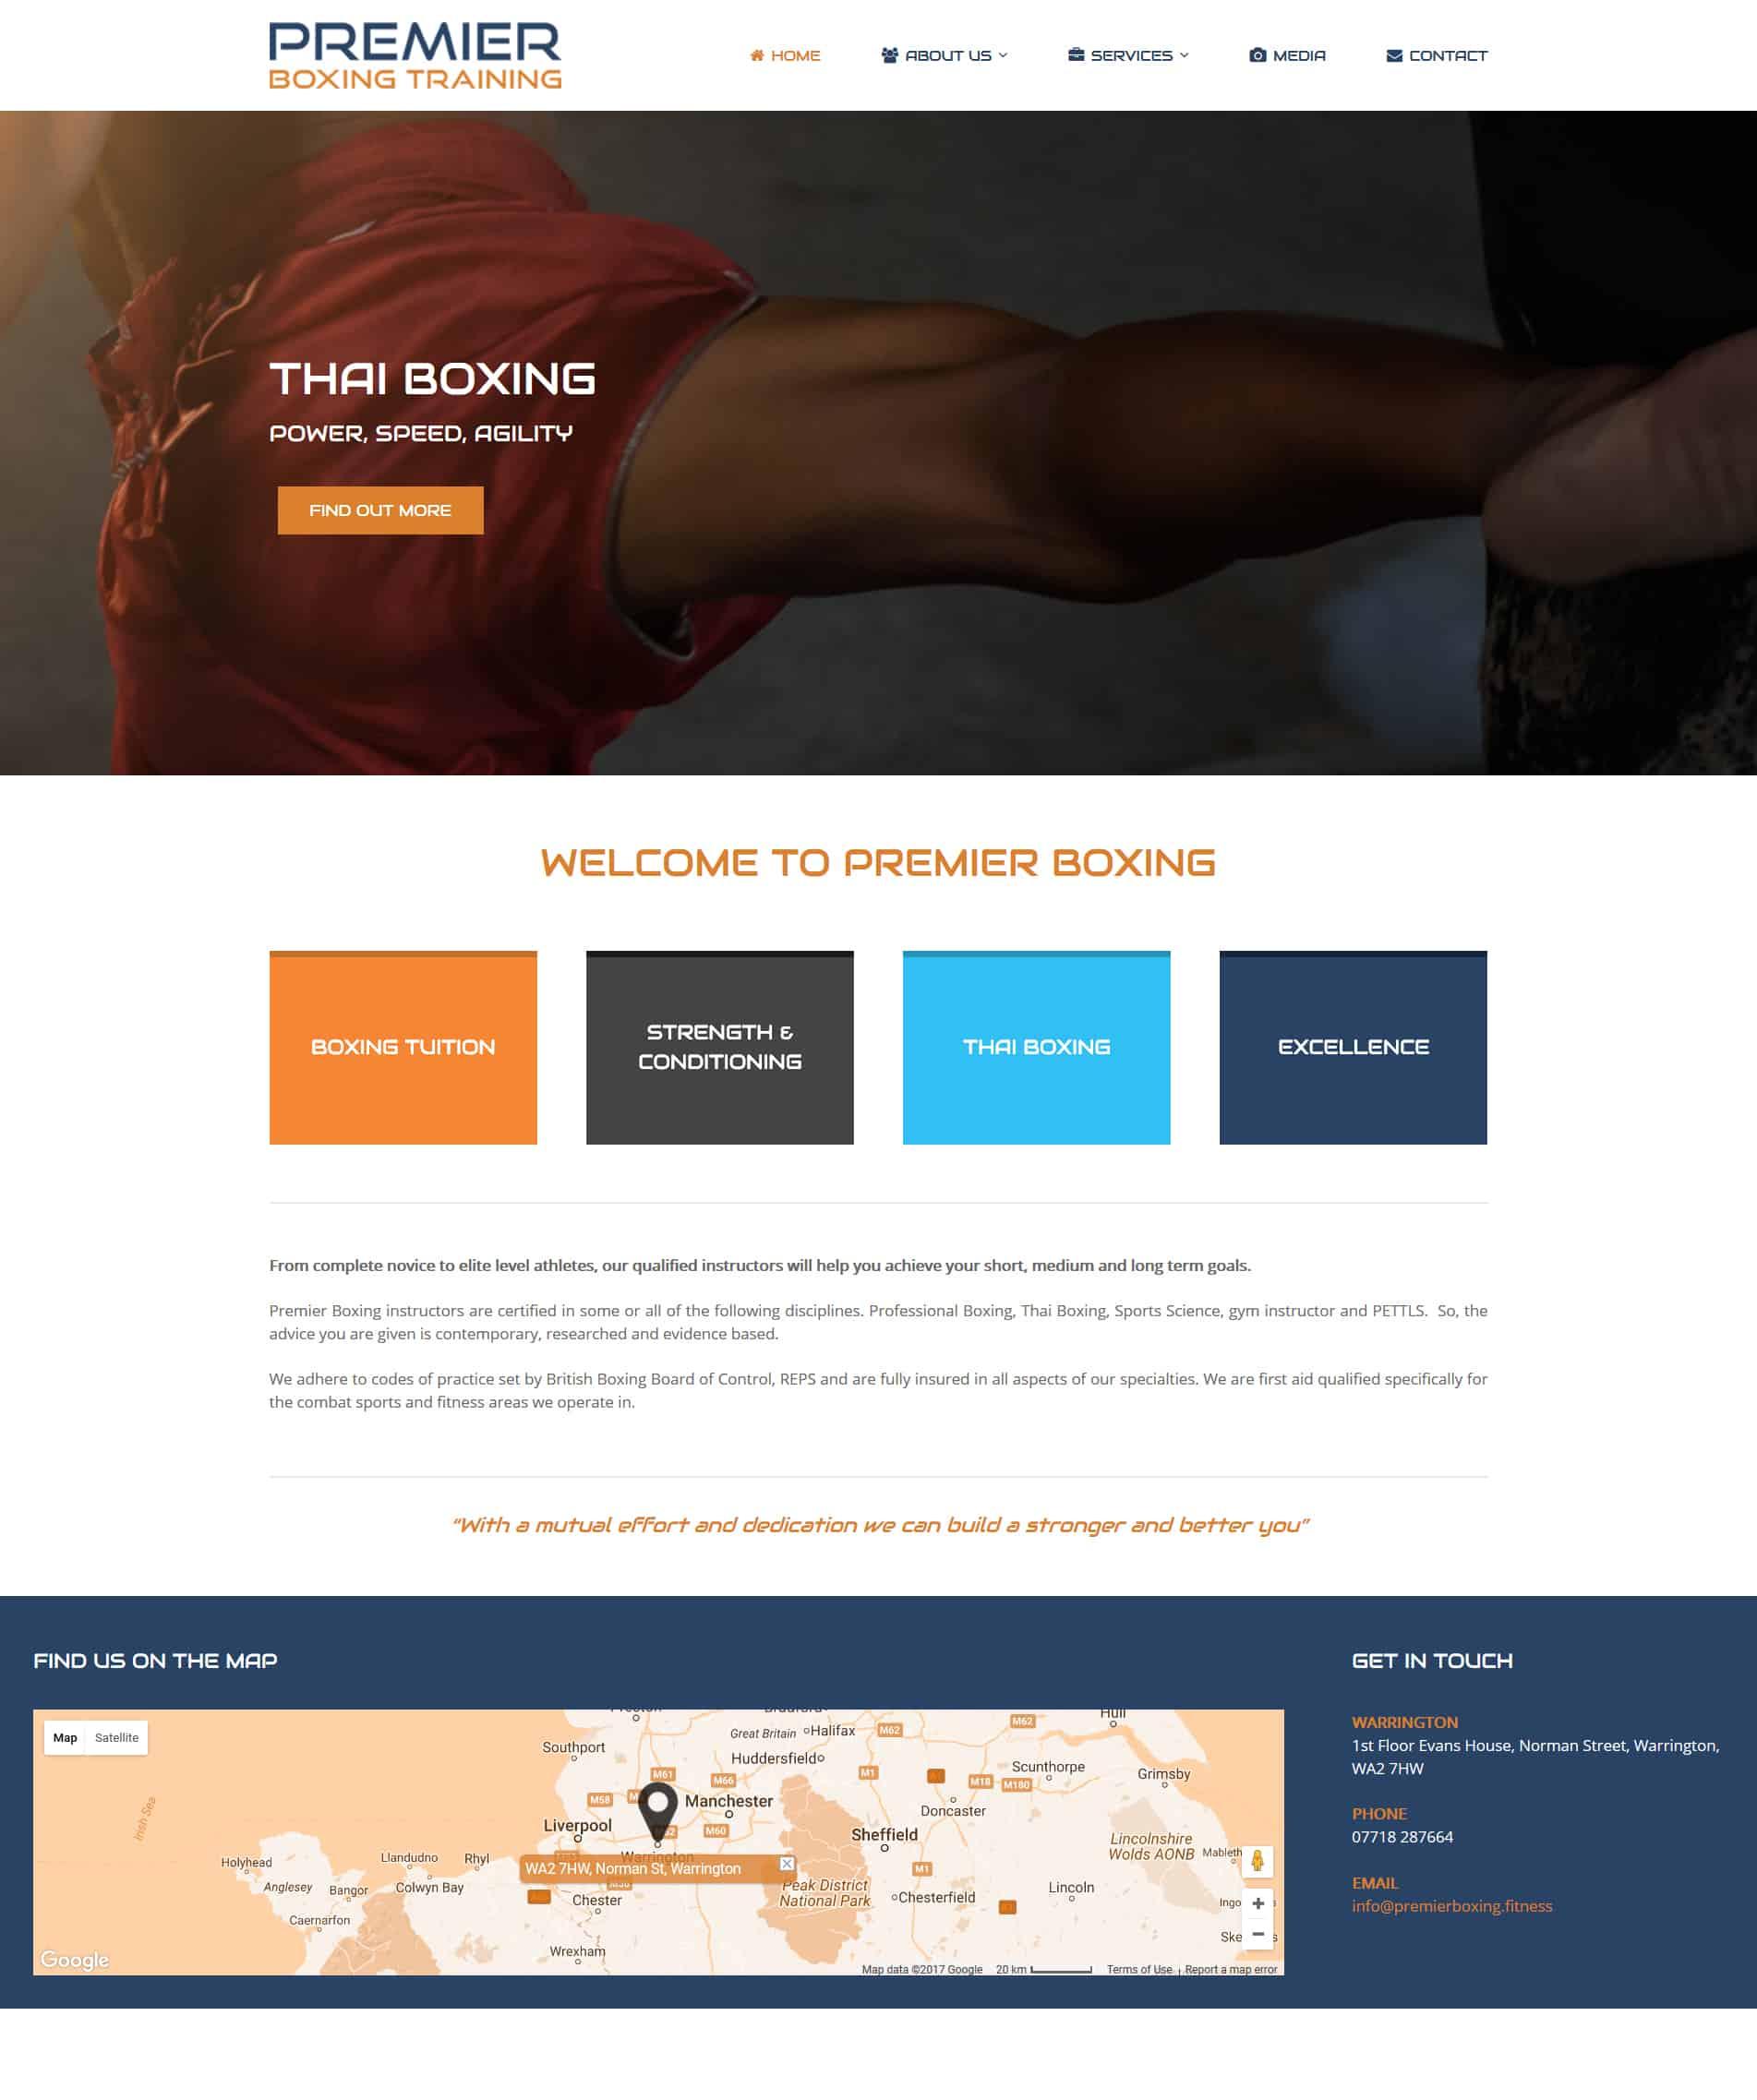 Boxing & Fitness Training Website Design